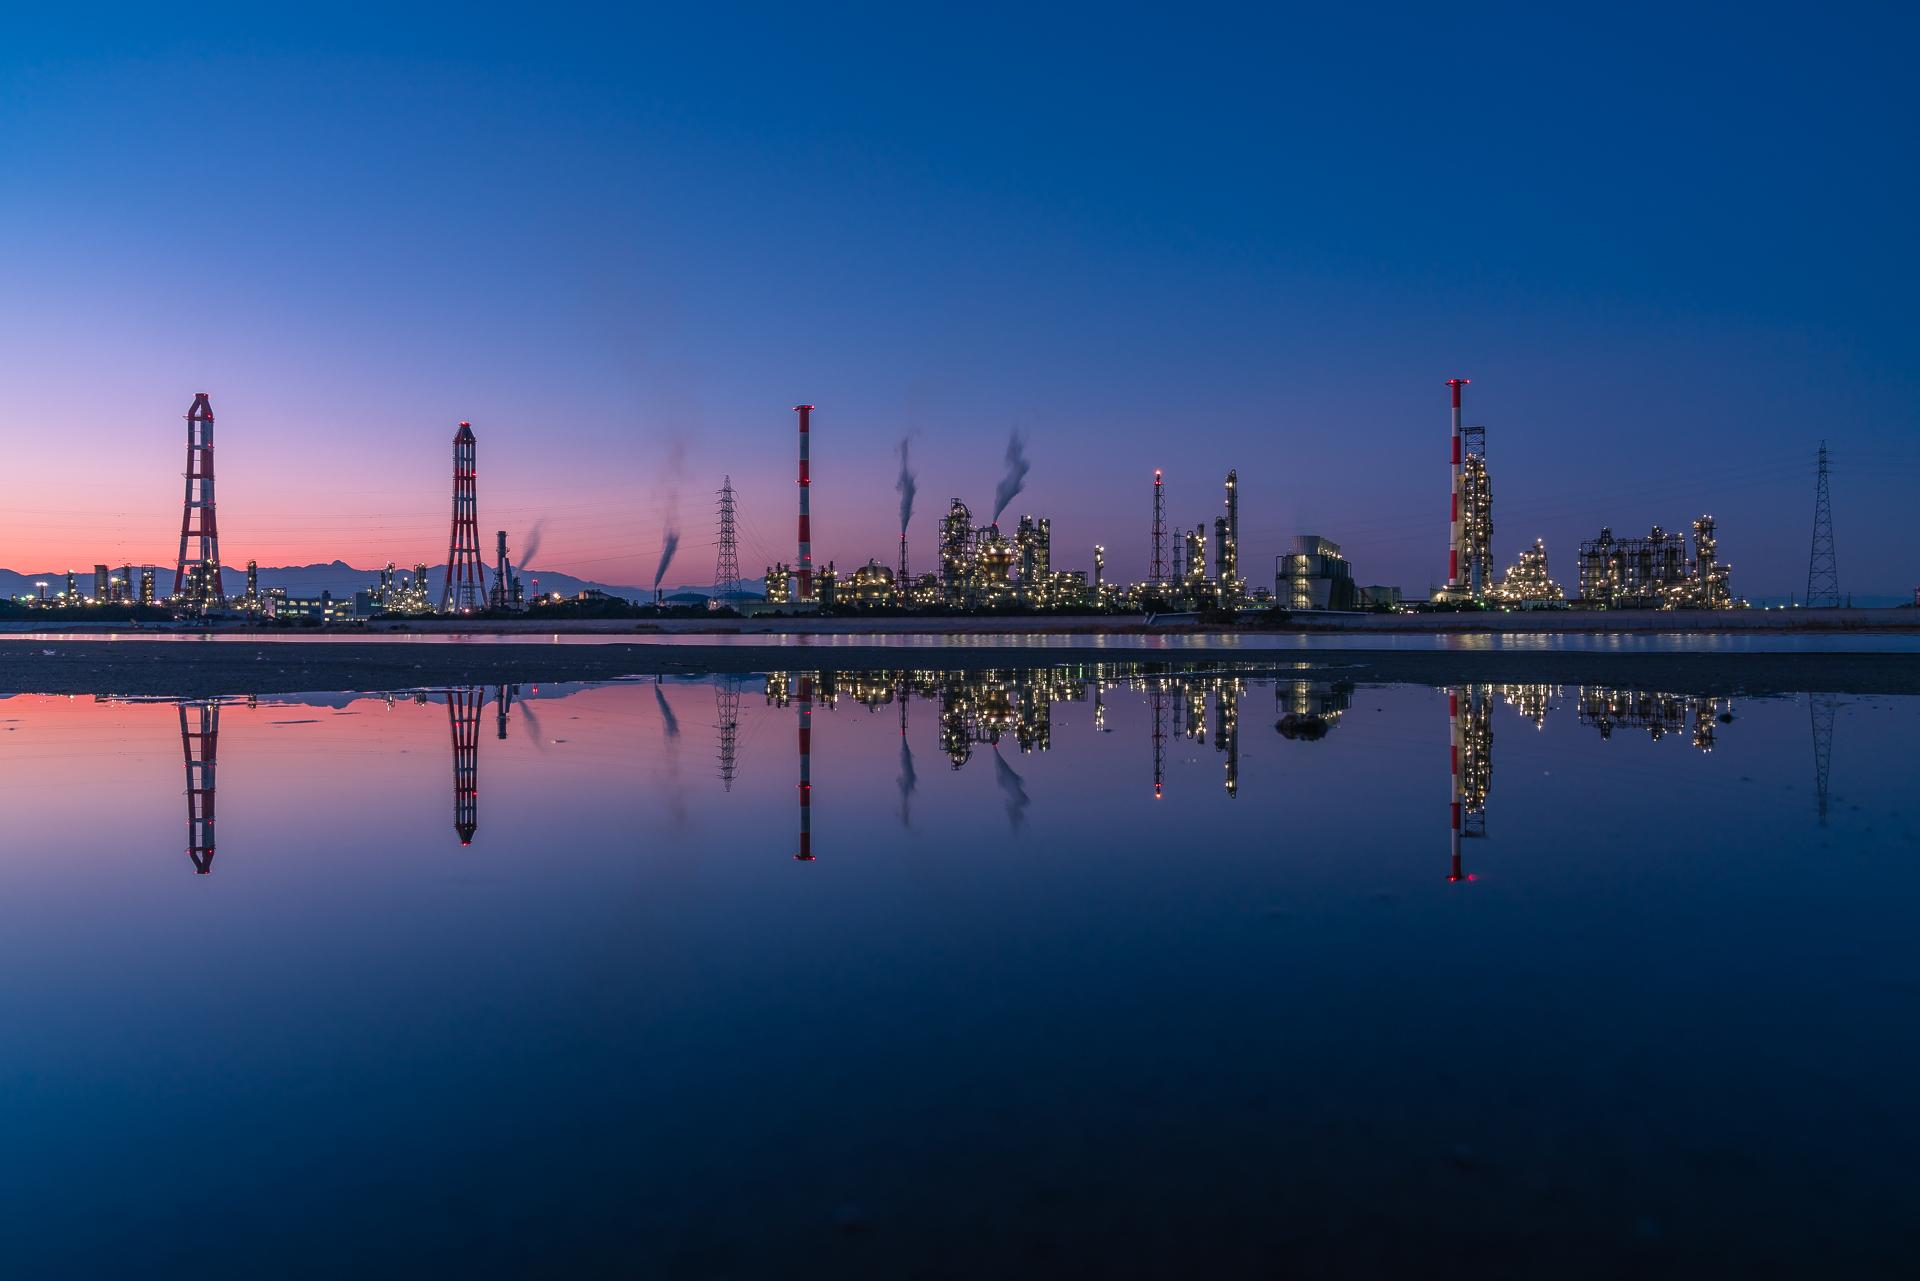 工場夜景(磯津・鈴鹿川河口エリア)2